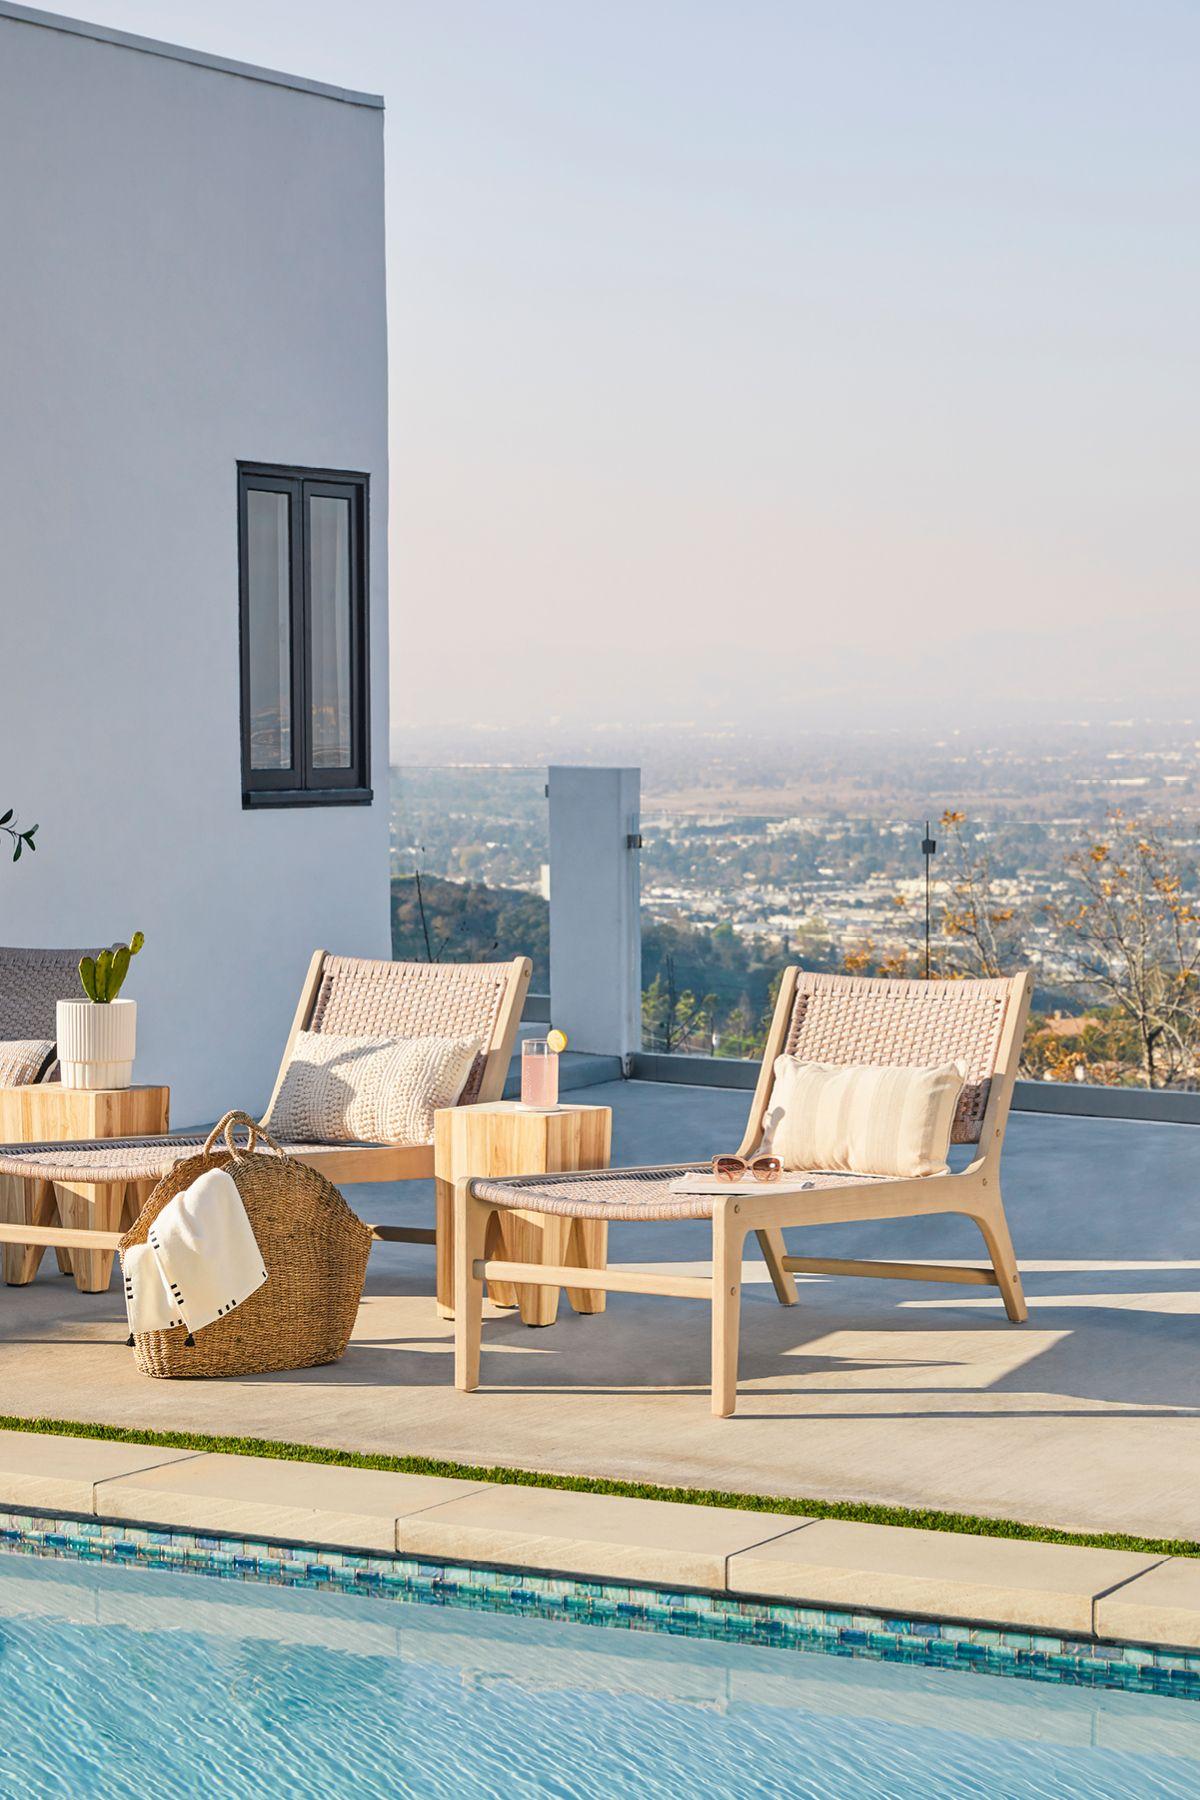 Reni Brushed Taupe Outdoor Lounger Modern Outdoor Lounge Chair Lounge Chair Outdoor Poolside Furniture Modern outdoor pool lounge chairs